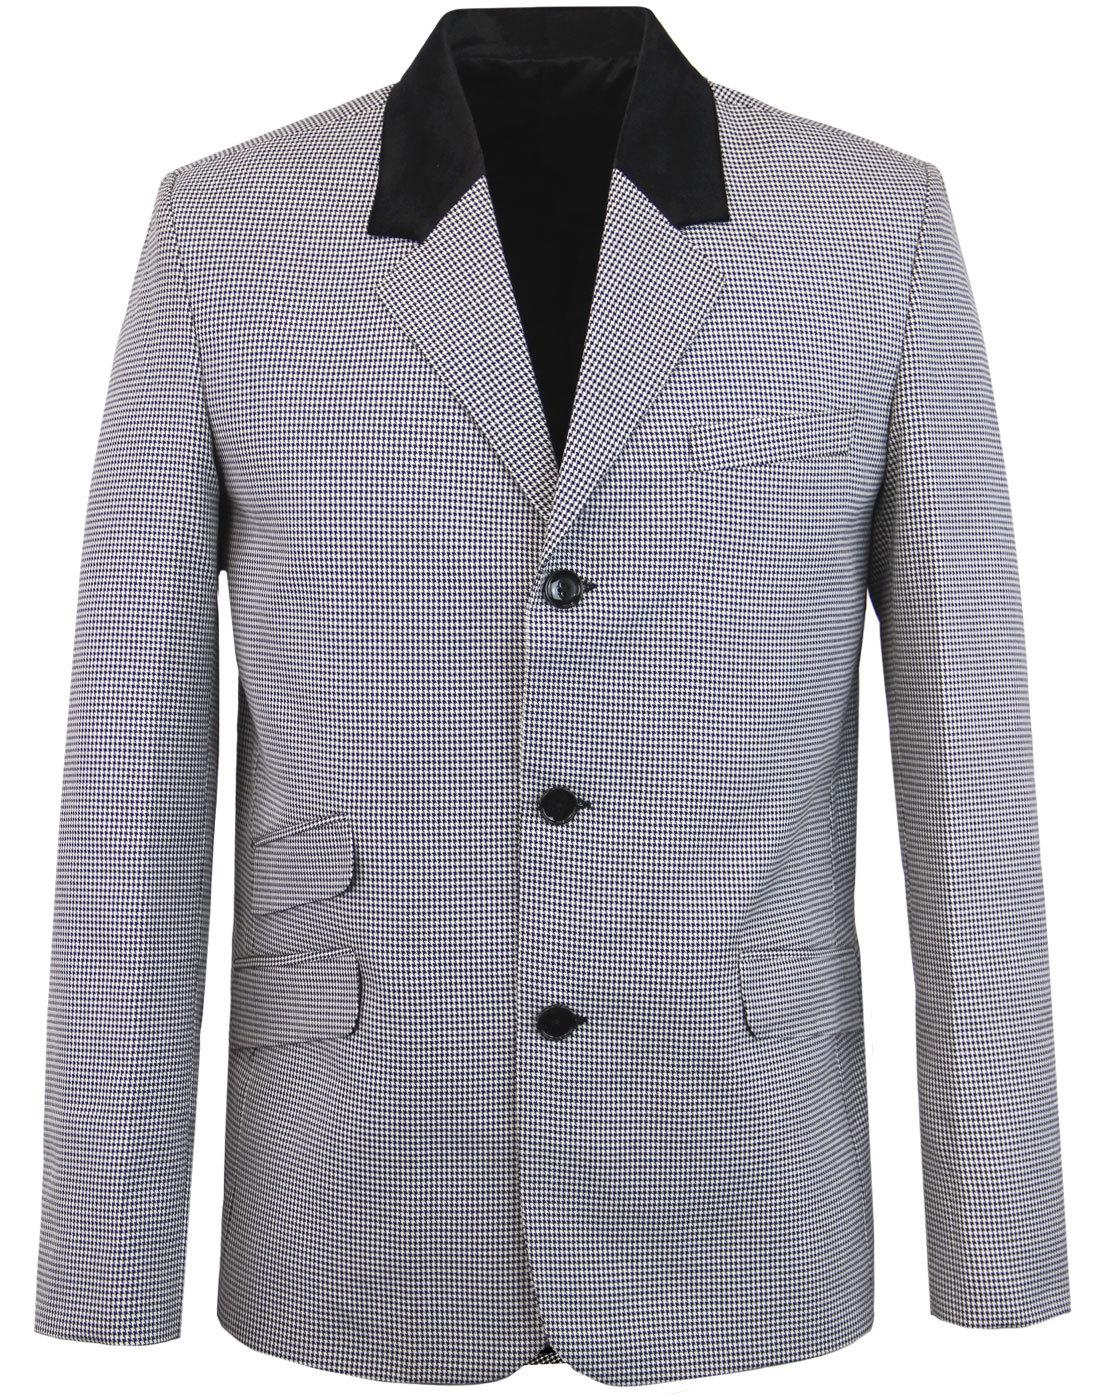 Stoned MADCAP ENGLAND Mod Dogtooth Blazer Jacket